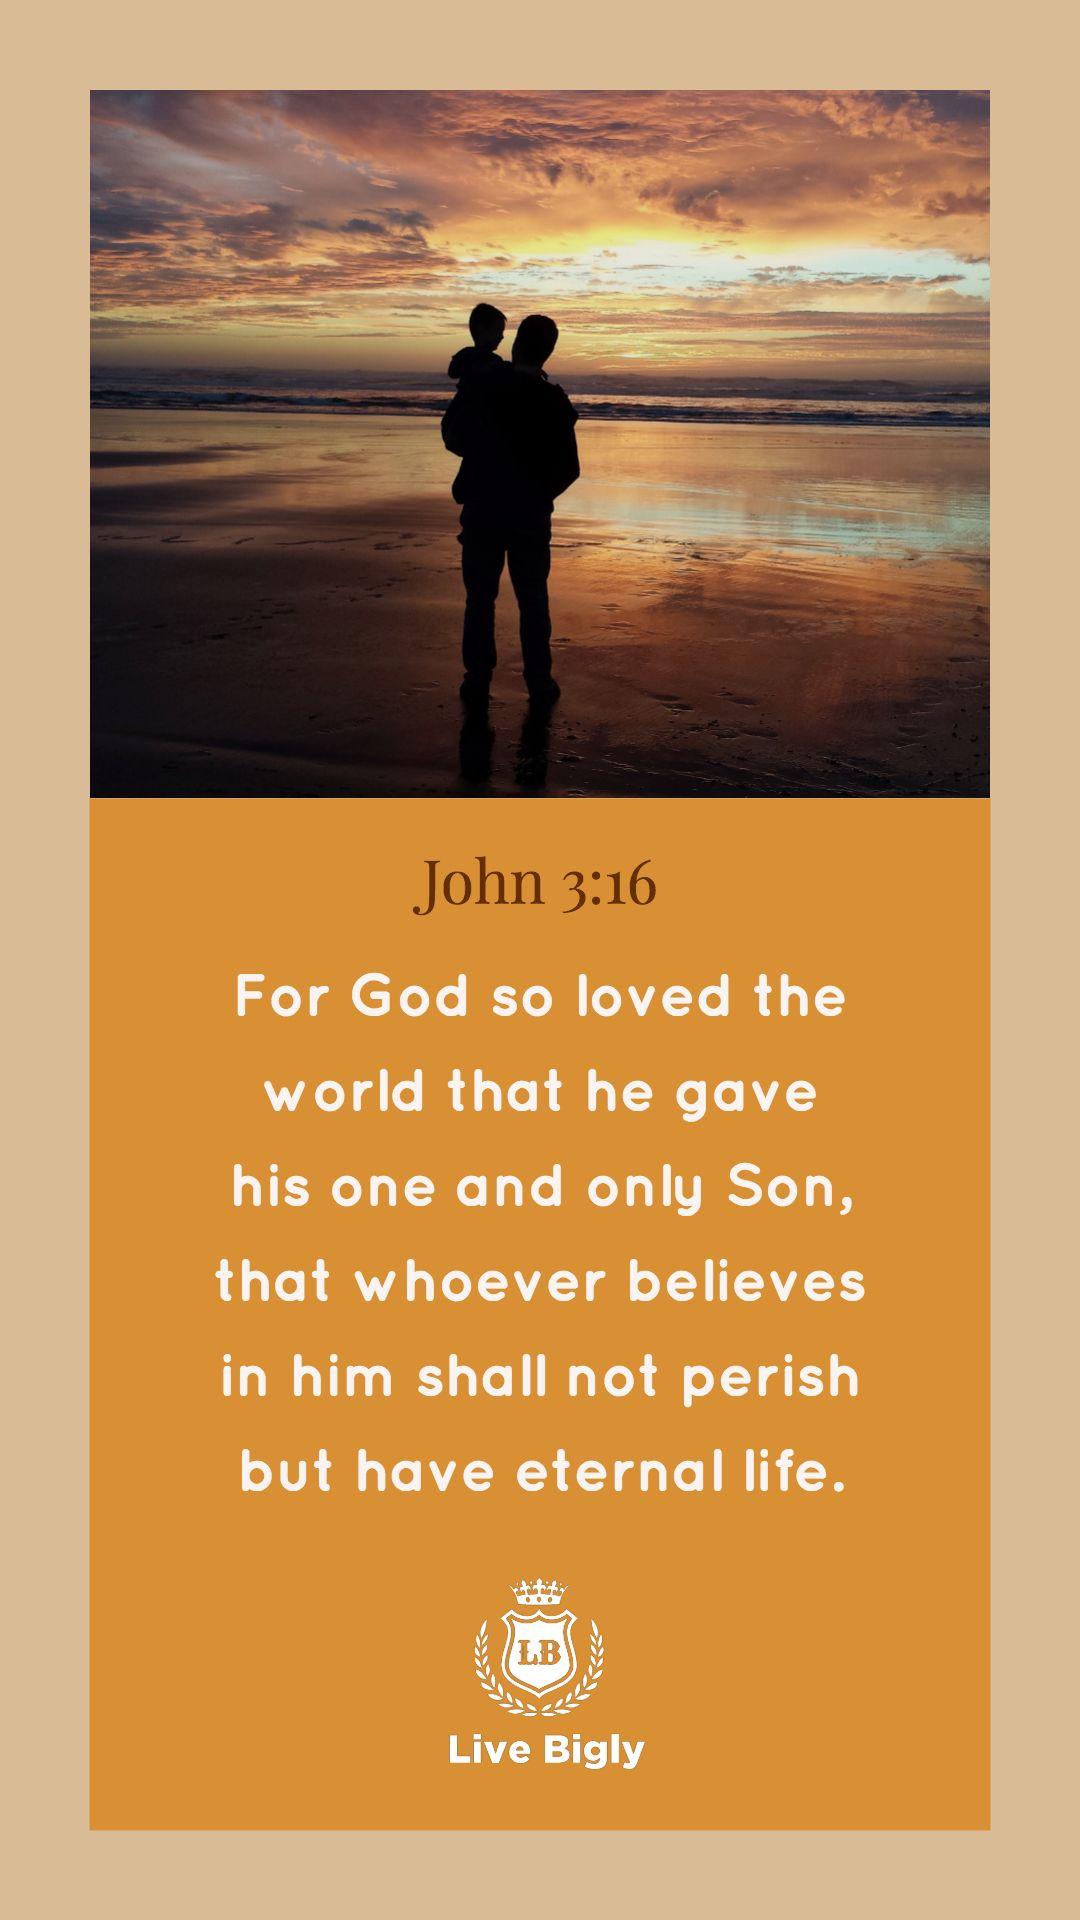 Pin on Jesus Christ/God